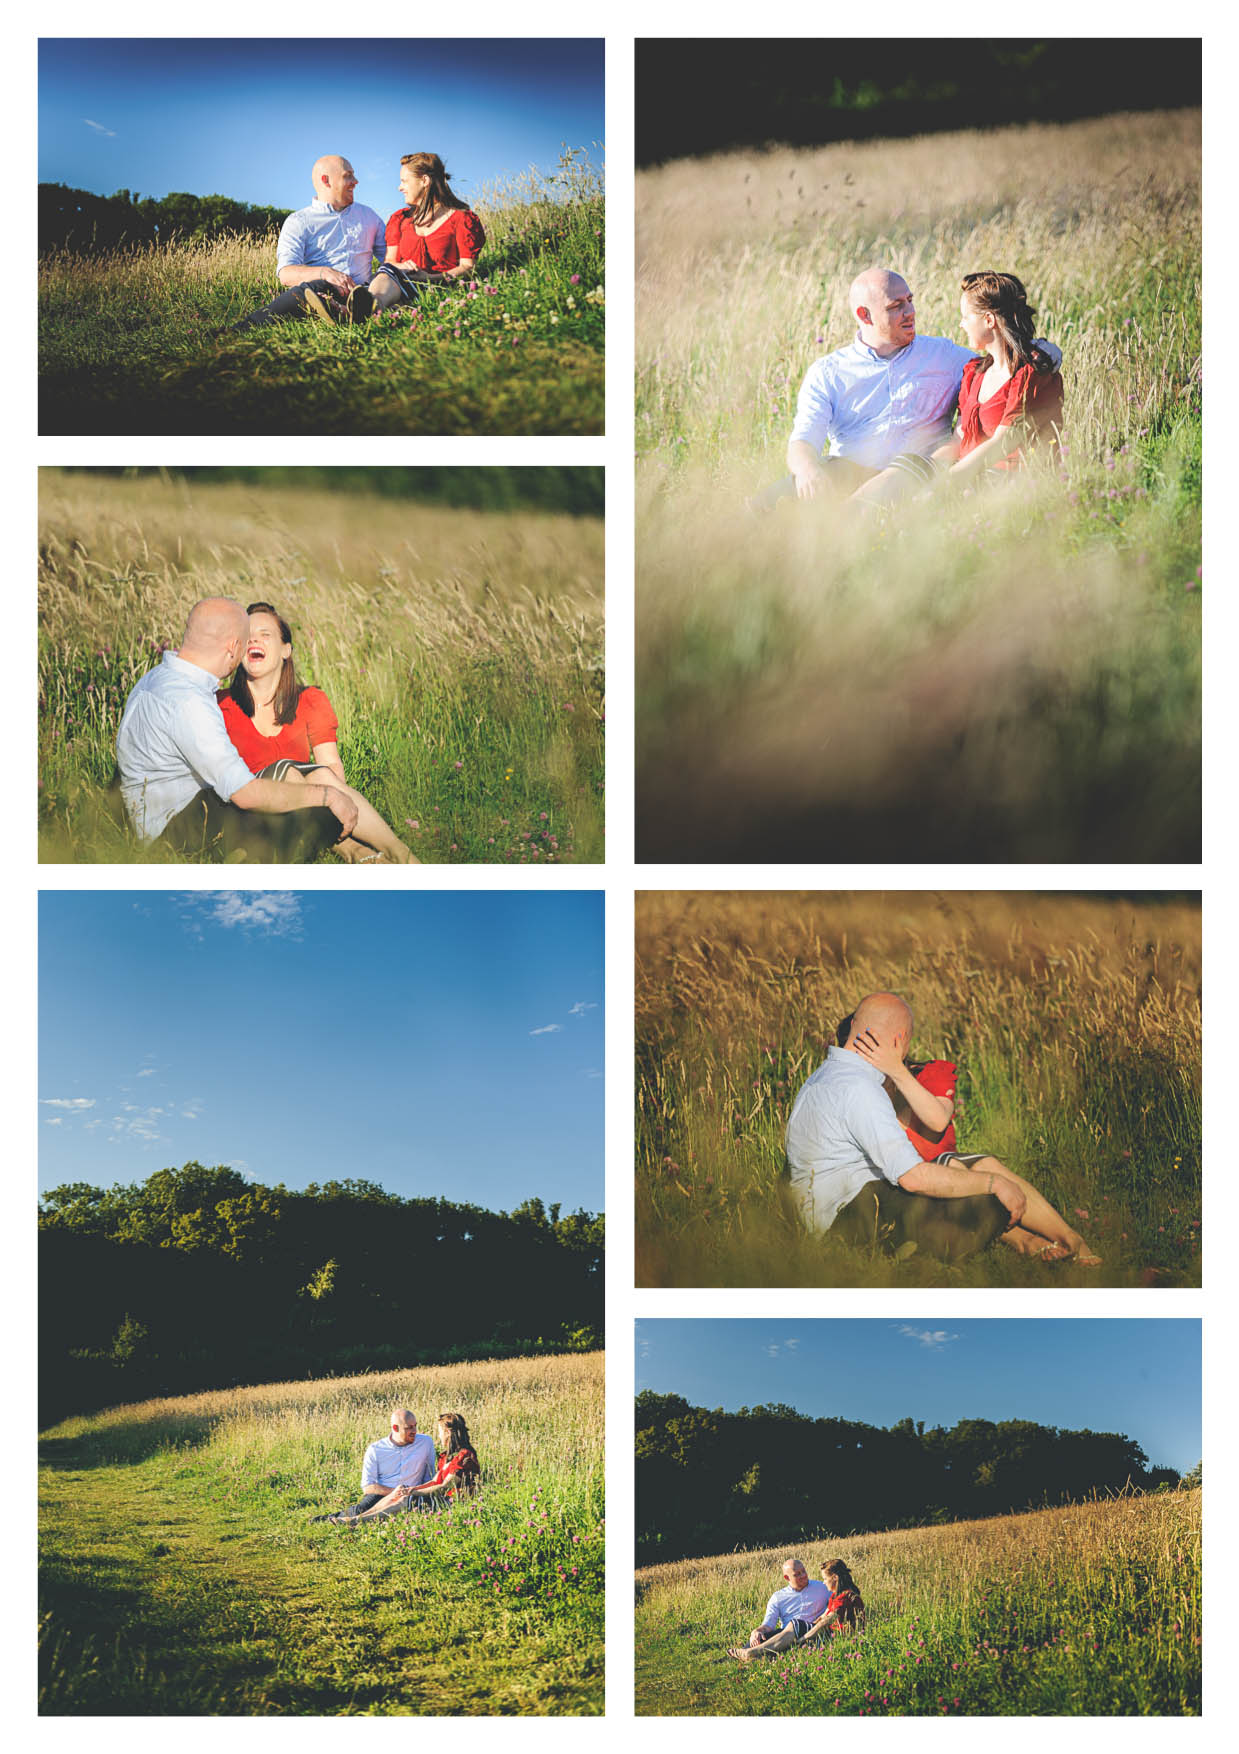 Vale of Glamorgan Wedding Photographer